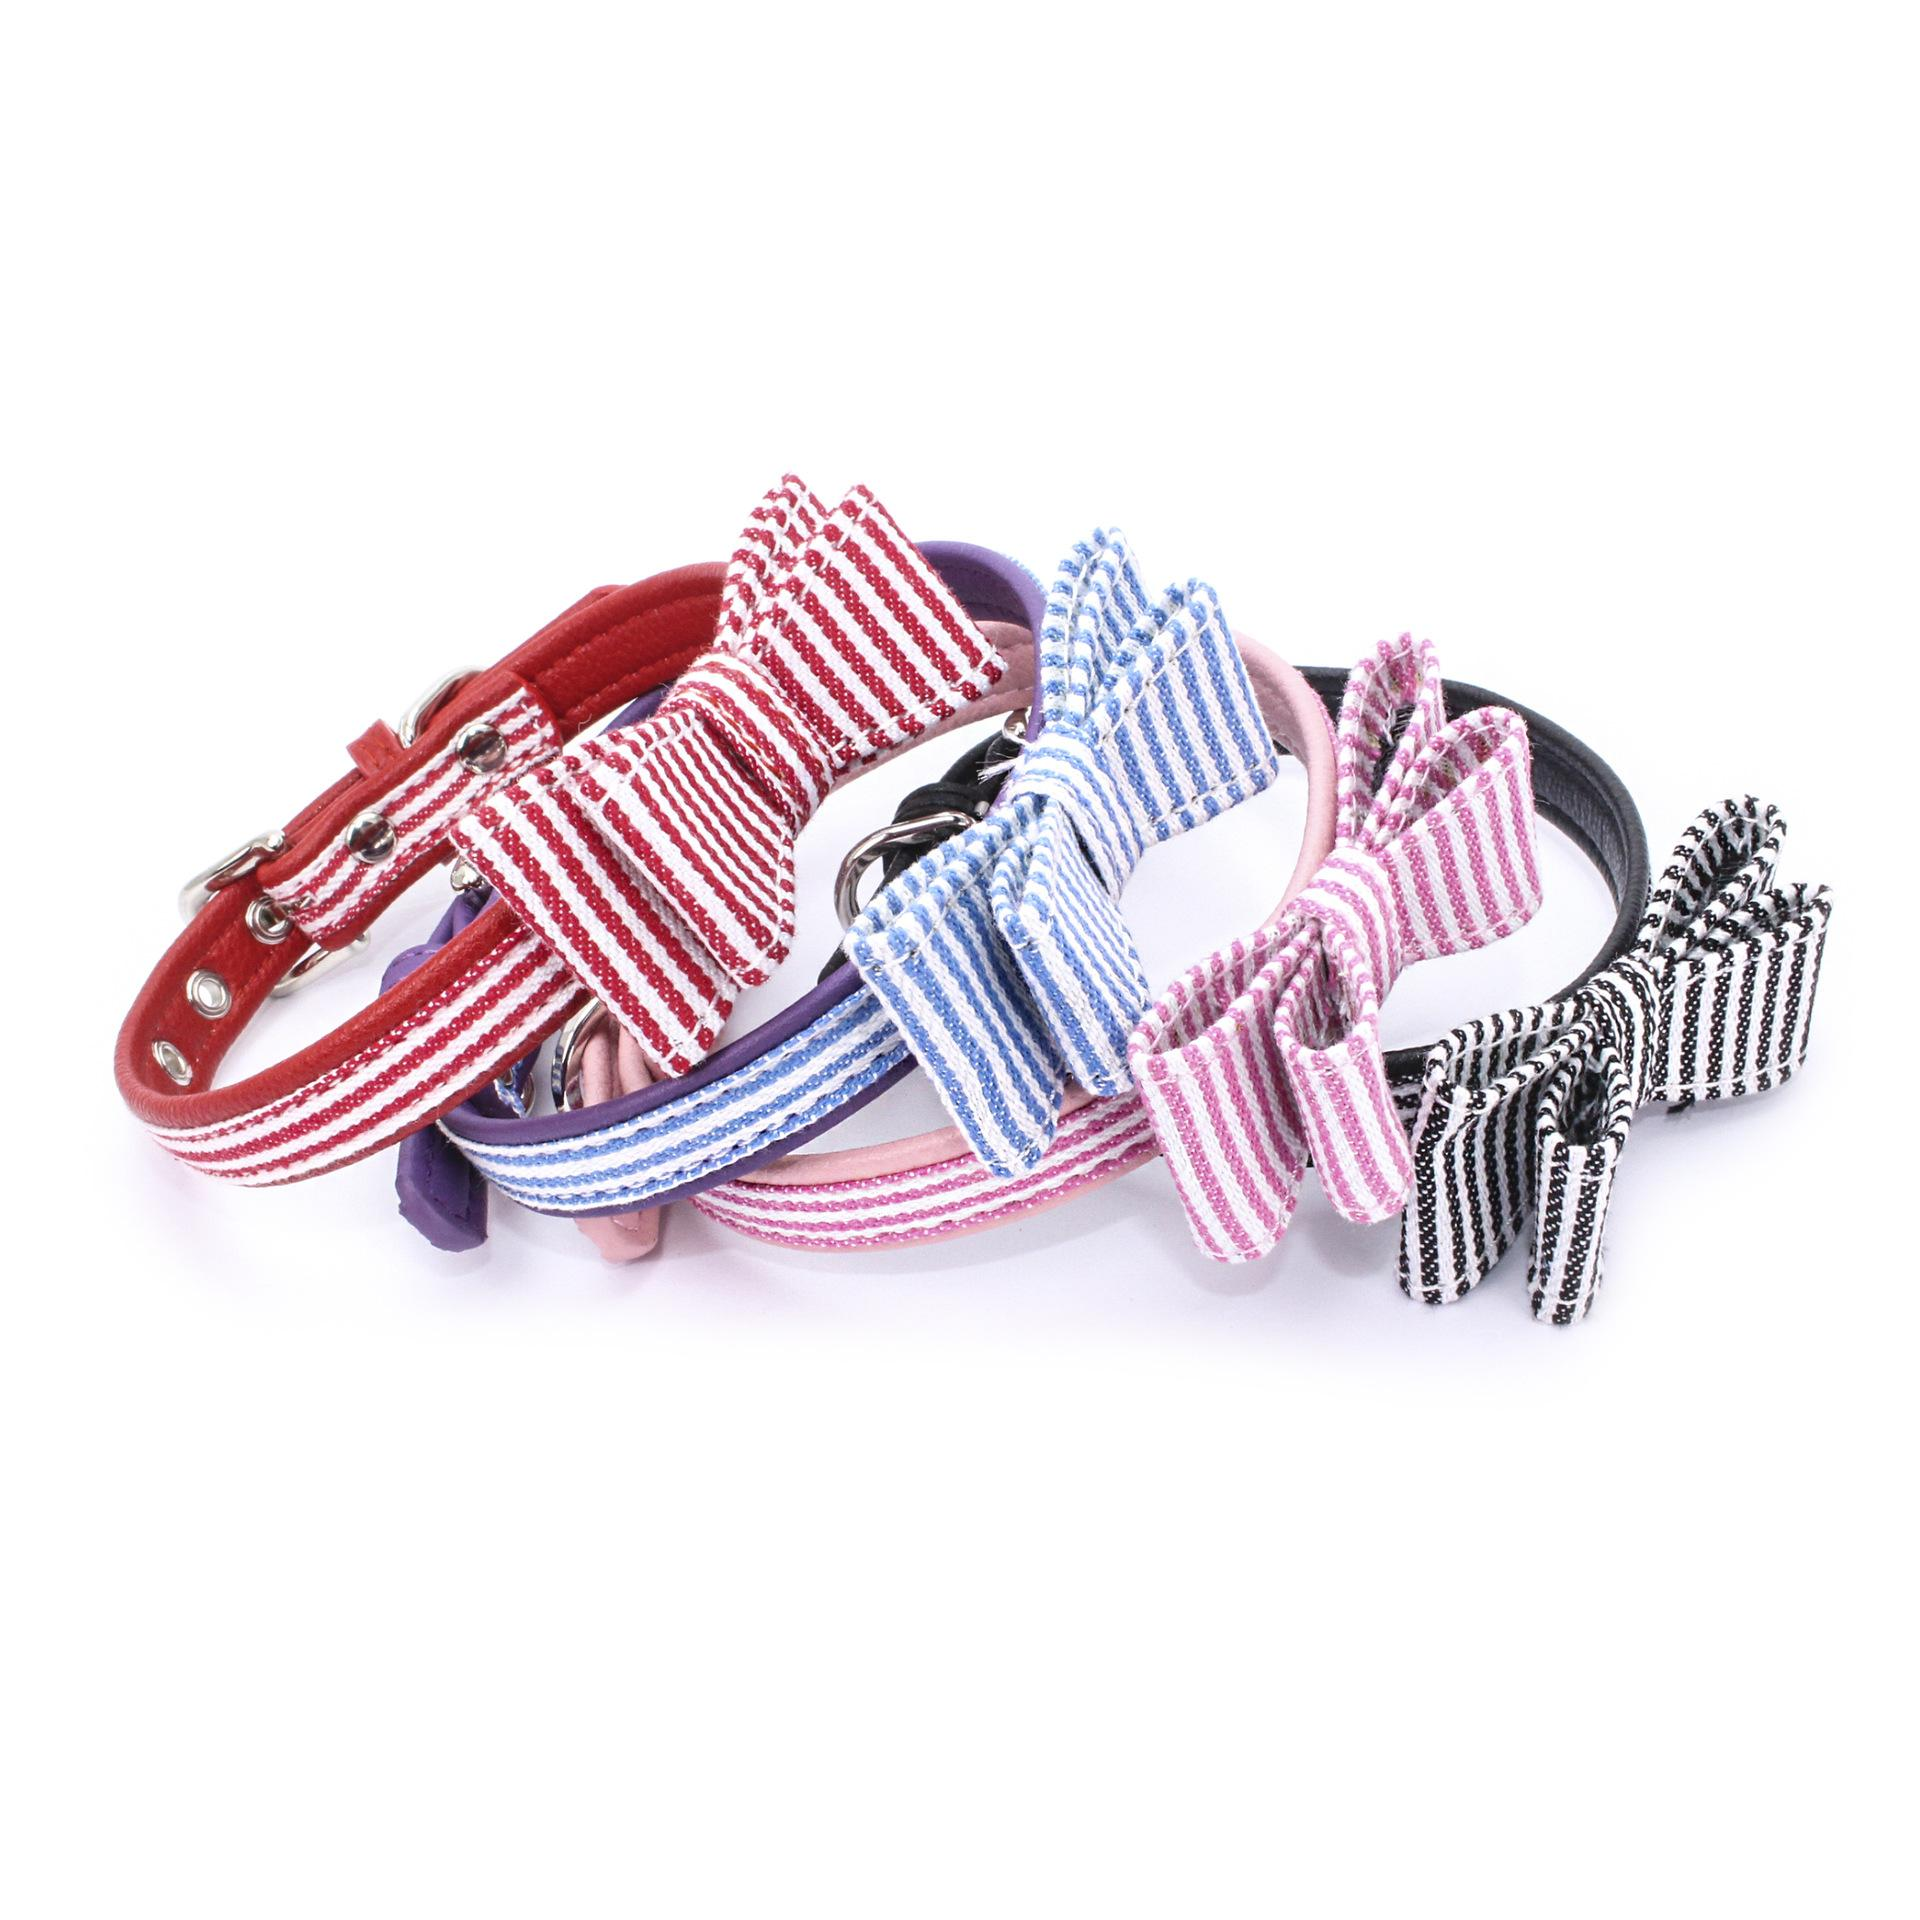 2018 Hot Sale Pet Dog Collars Superfiber Bow Tie Collars Adjustable Length Collars